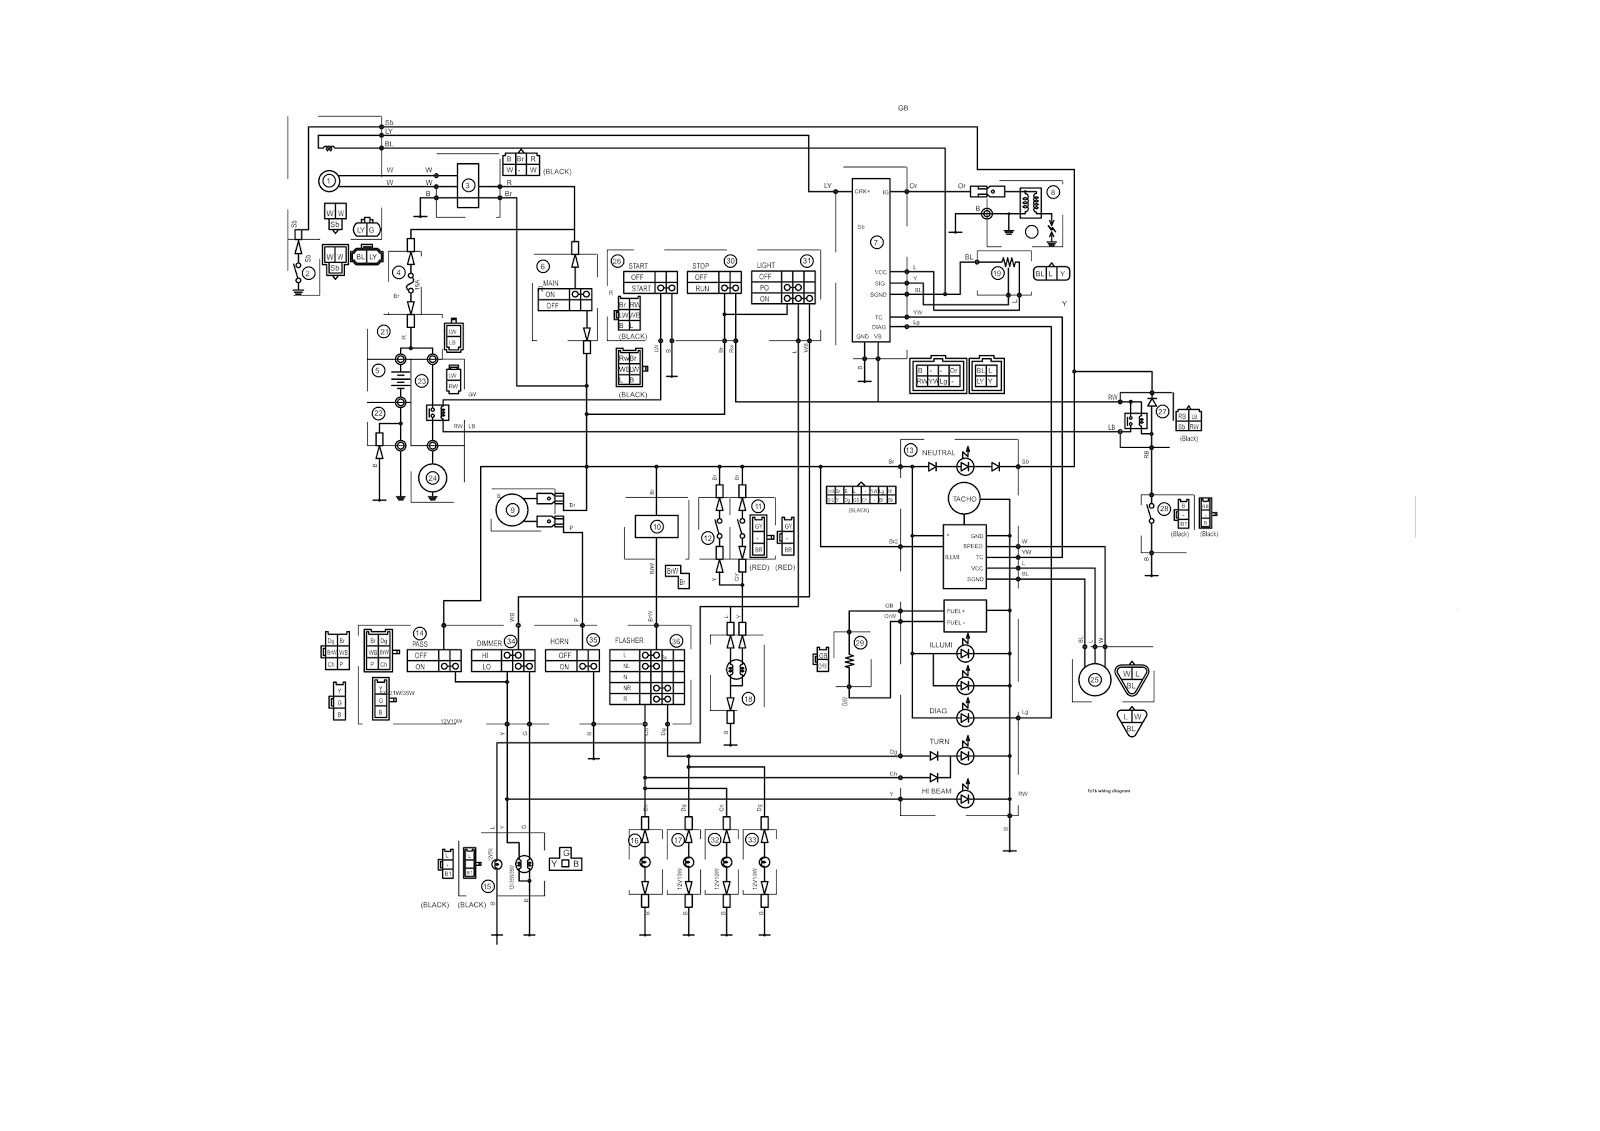 1986 chevy c10 ignition wiring diagram ford externally regulated alternator truck parts catalog html imageresizertool com